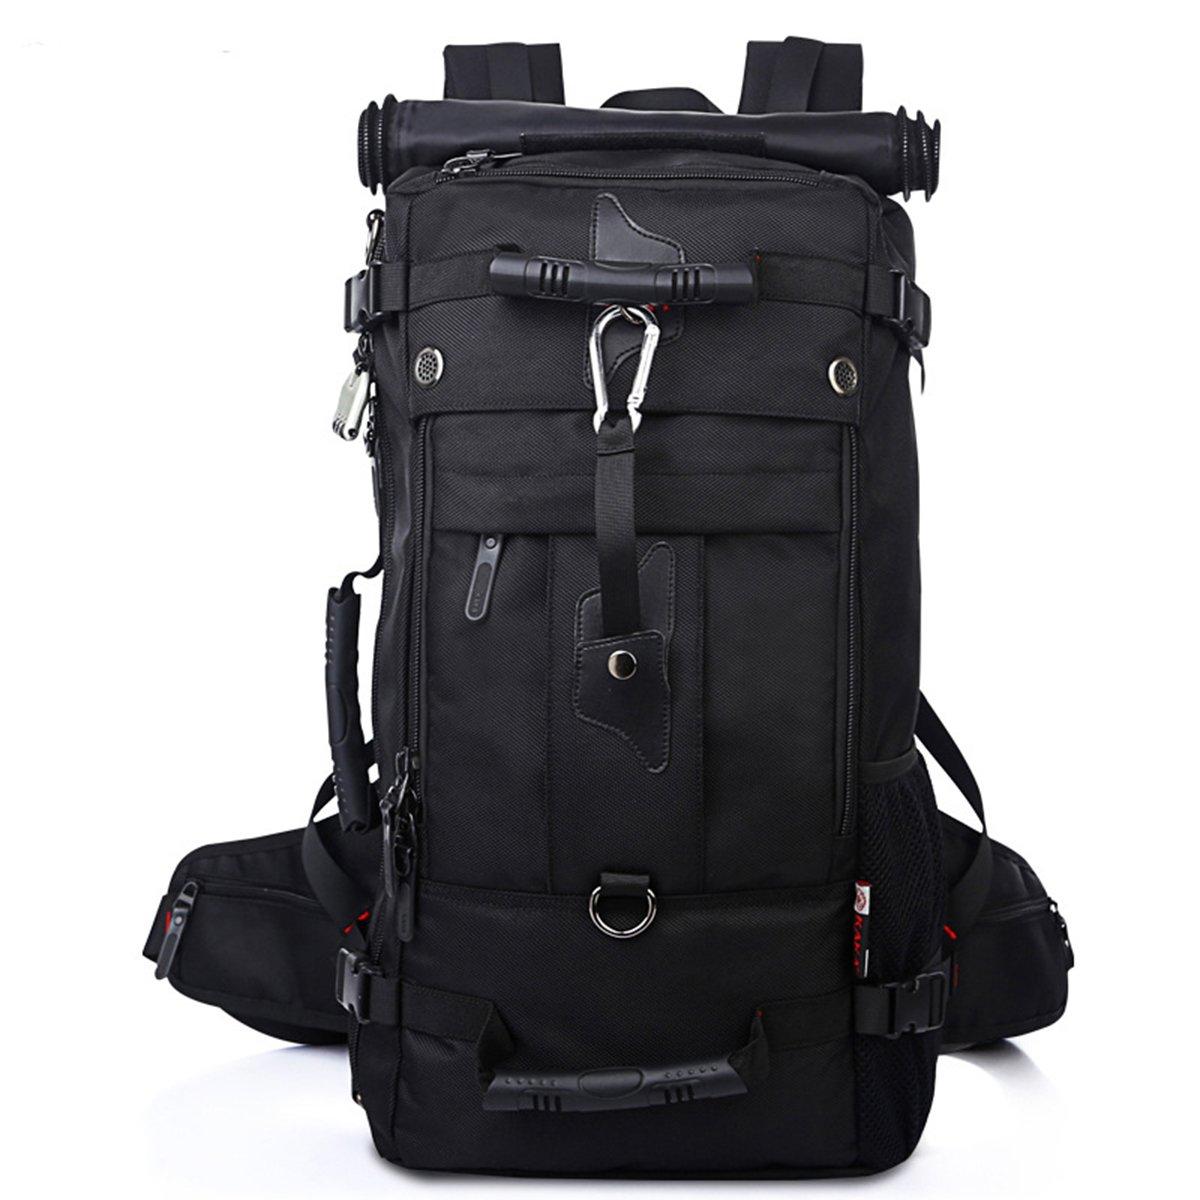 Fanspack ザック アウトドア バッグ 山登り リュック 登山 デイパック 黒 メンズ レディース ポケット 50L 大型 パスワード ロック付き オックスフォード パスワード ロック付き B078MYFW7Q ブラック ブラック